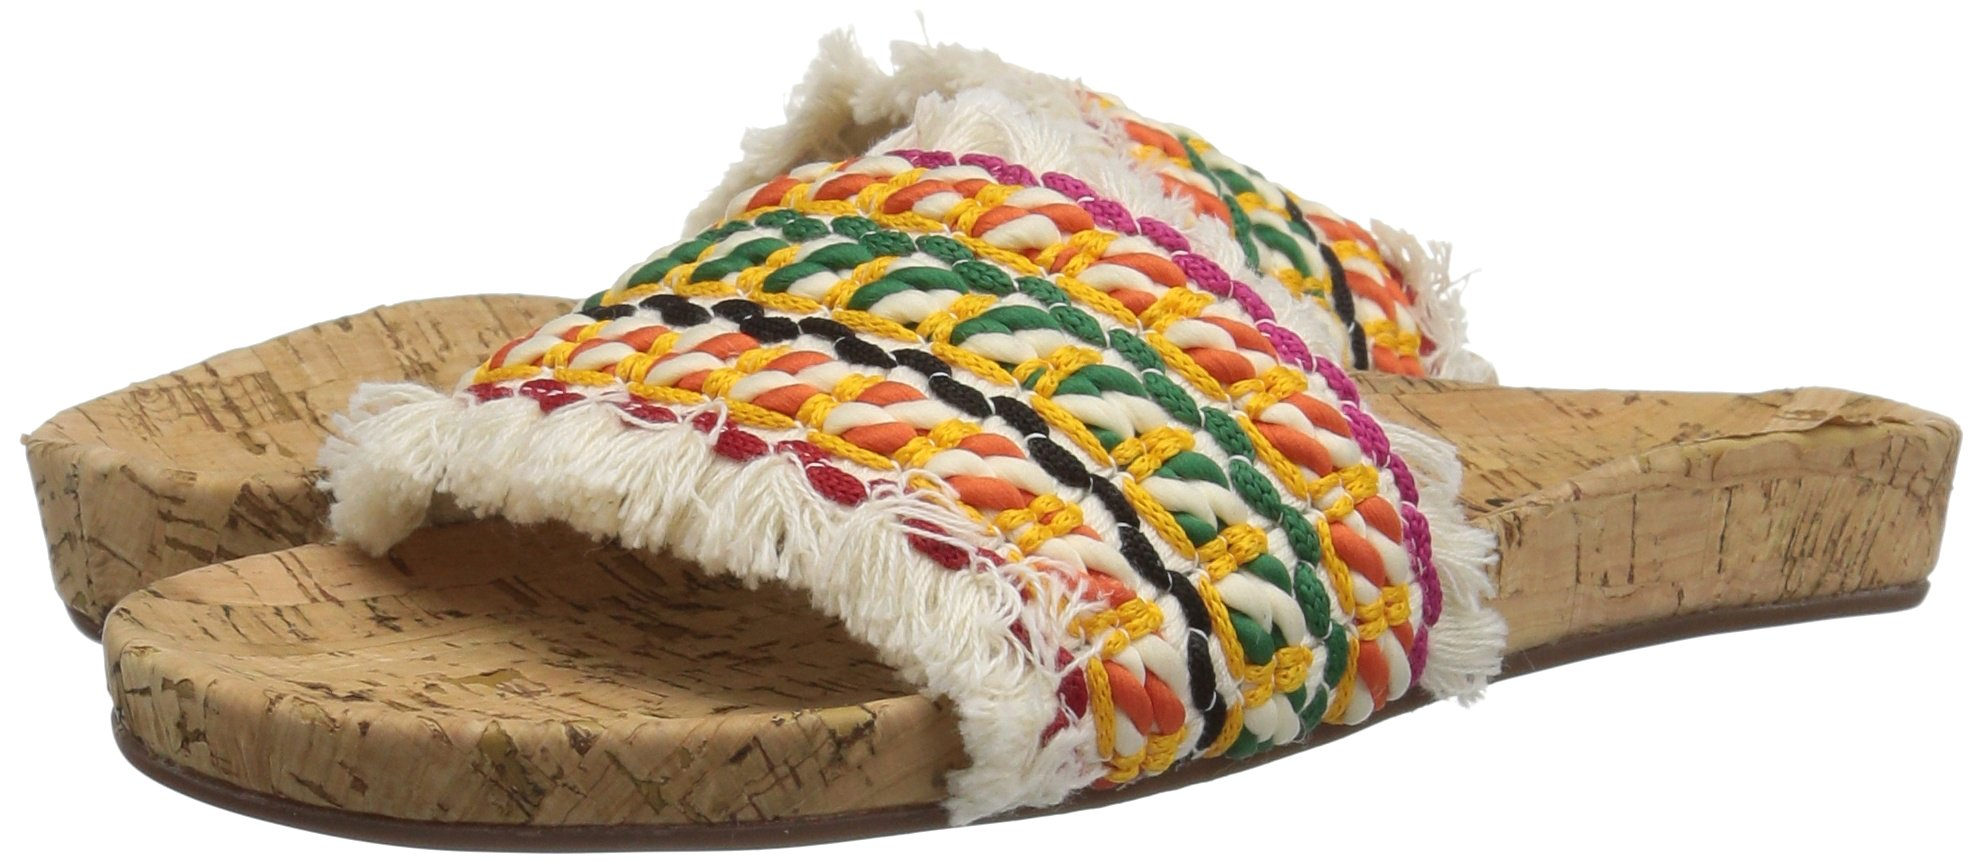 Schutz Women's KAHARA Slide Sandal, Multi, 9 M US by Schutz (Image #6)